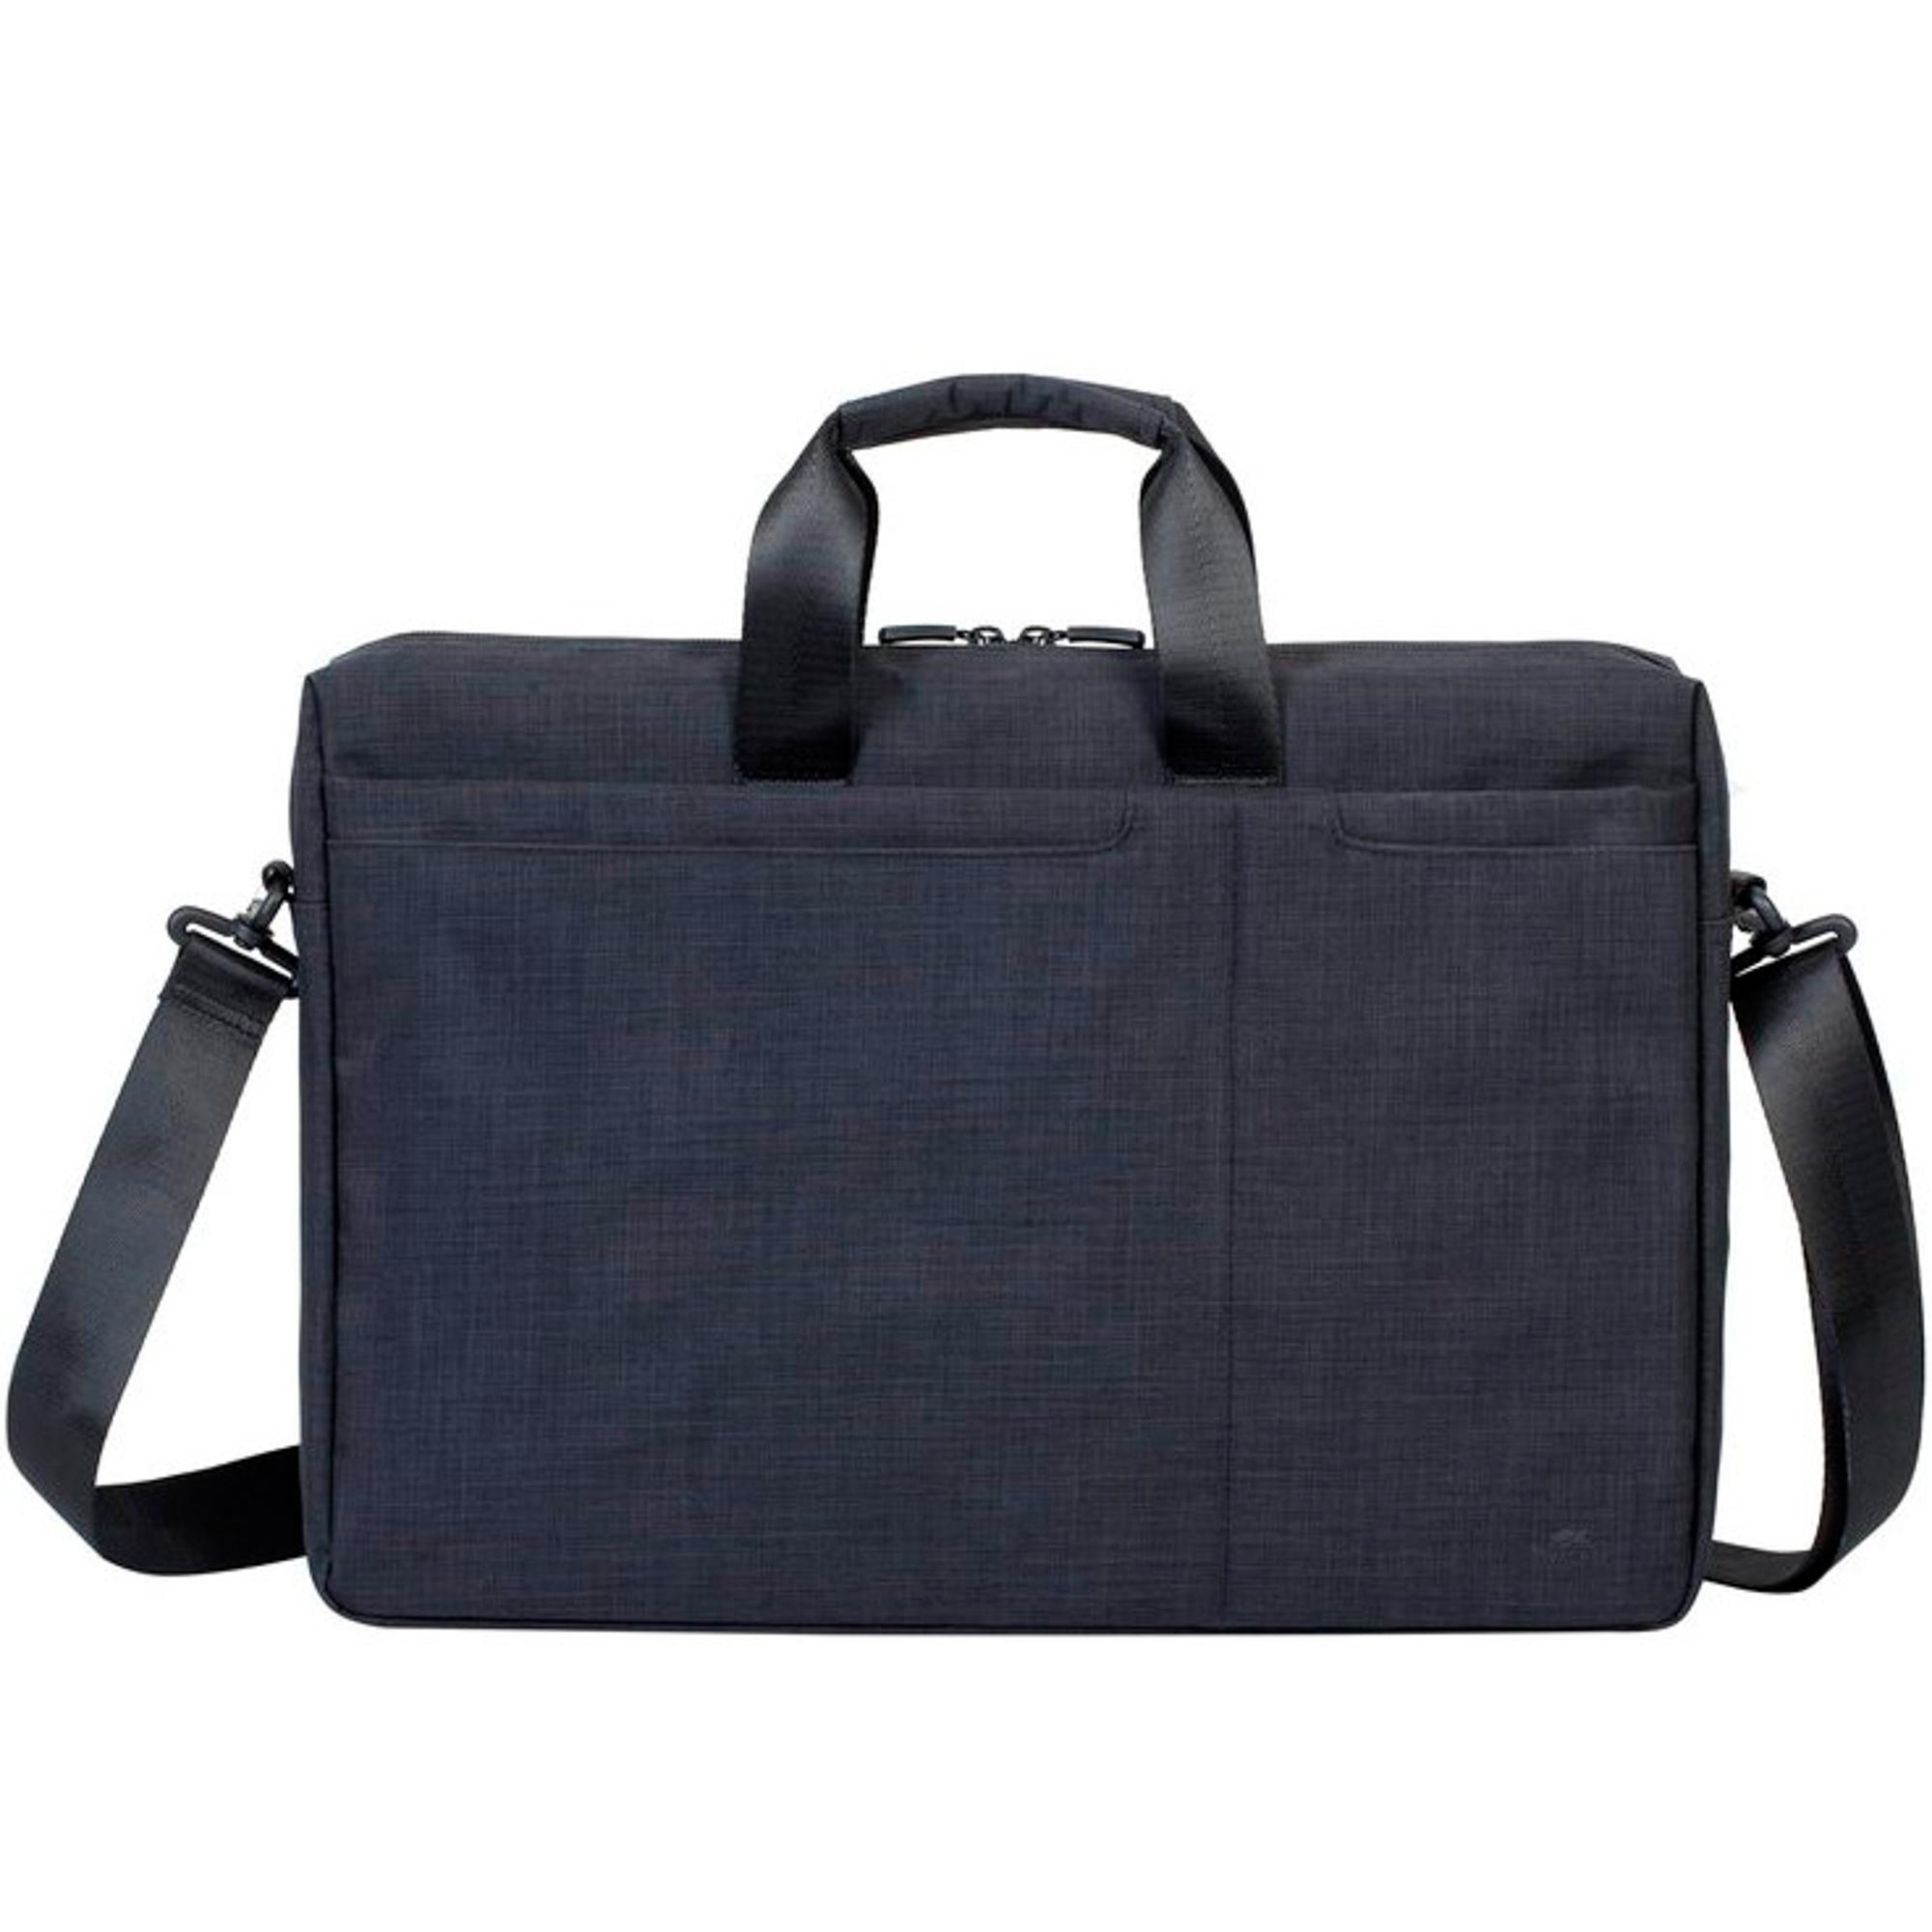 сумка для ноутбука rivacase 8920 13 3 black Сумка для ноутбука RivaCase 8355 Black